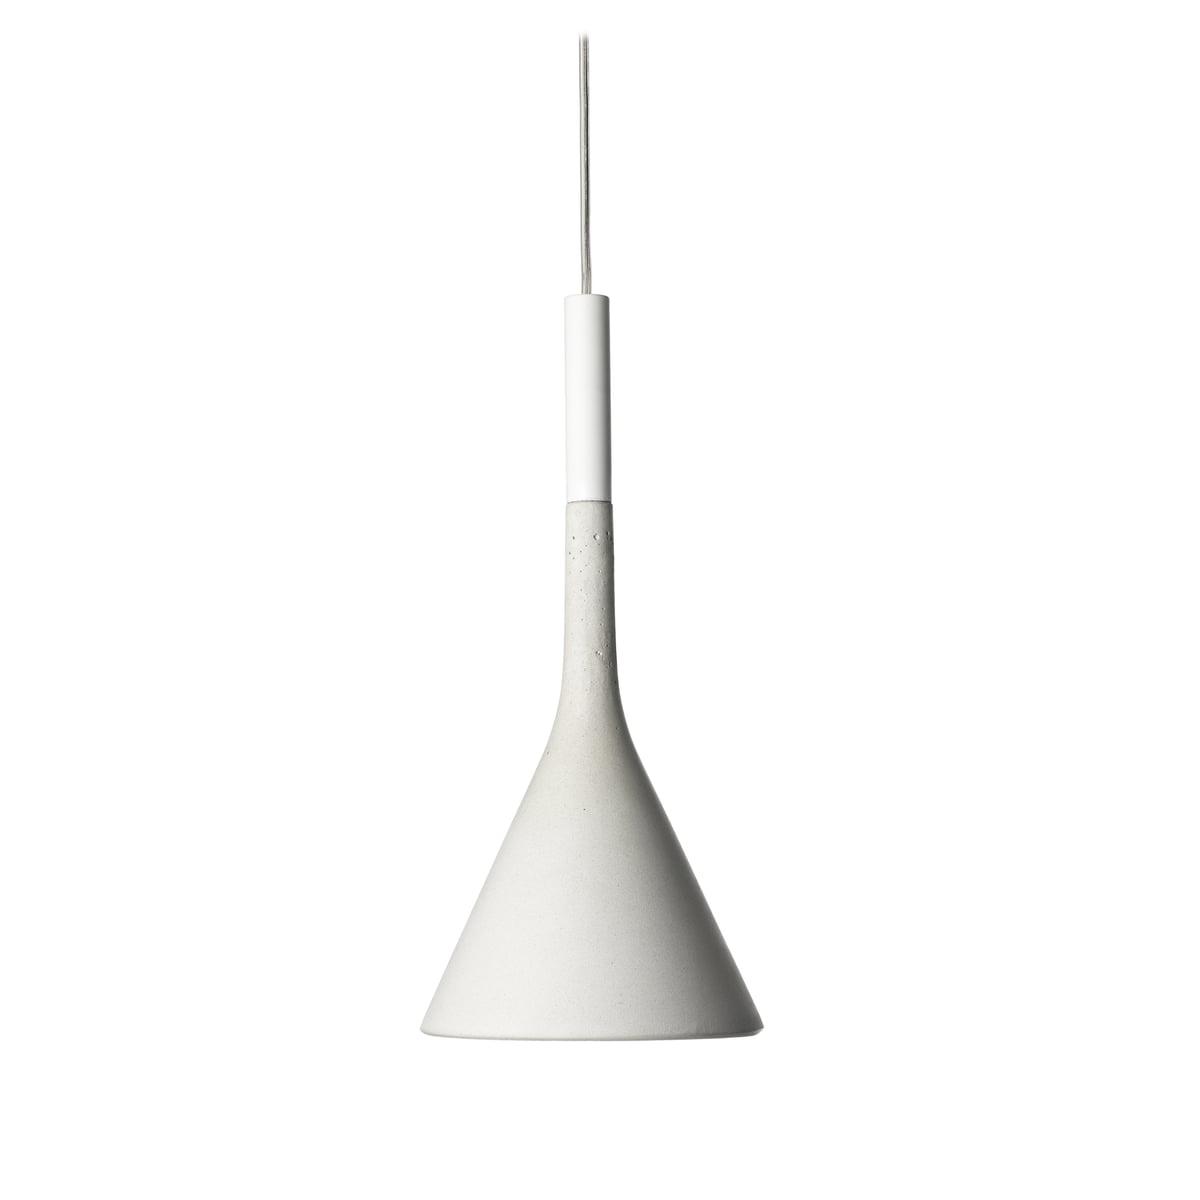 Aplomb led pendant lamp by foscarini foscarini aplomb pendant lamp white aloadofball Image collections